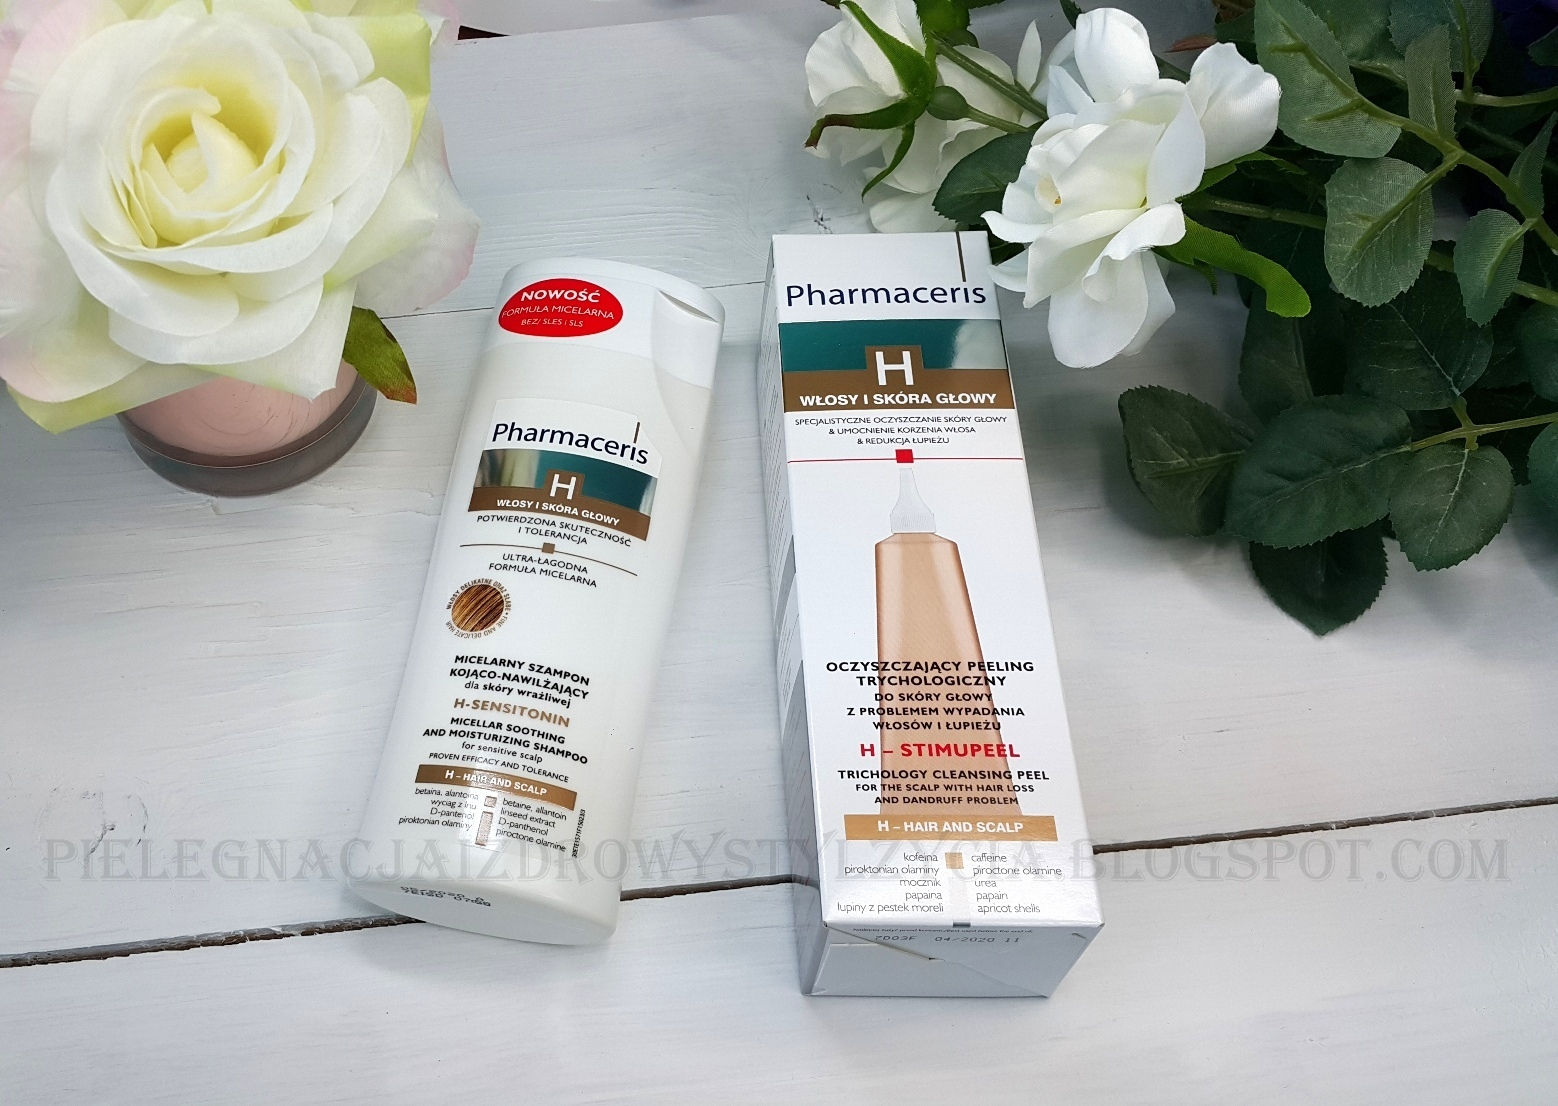 Upominki See Bloggers - peeling do skóry głowy i micelarny szampon Pharmaceris